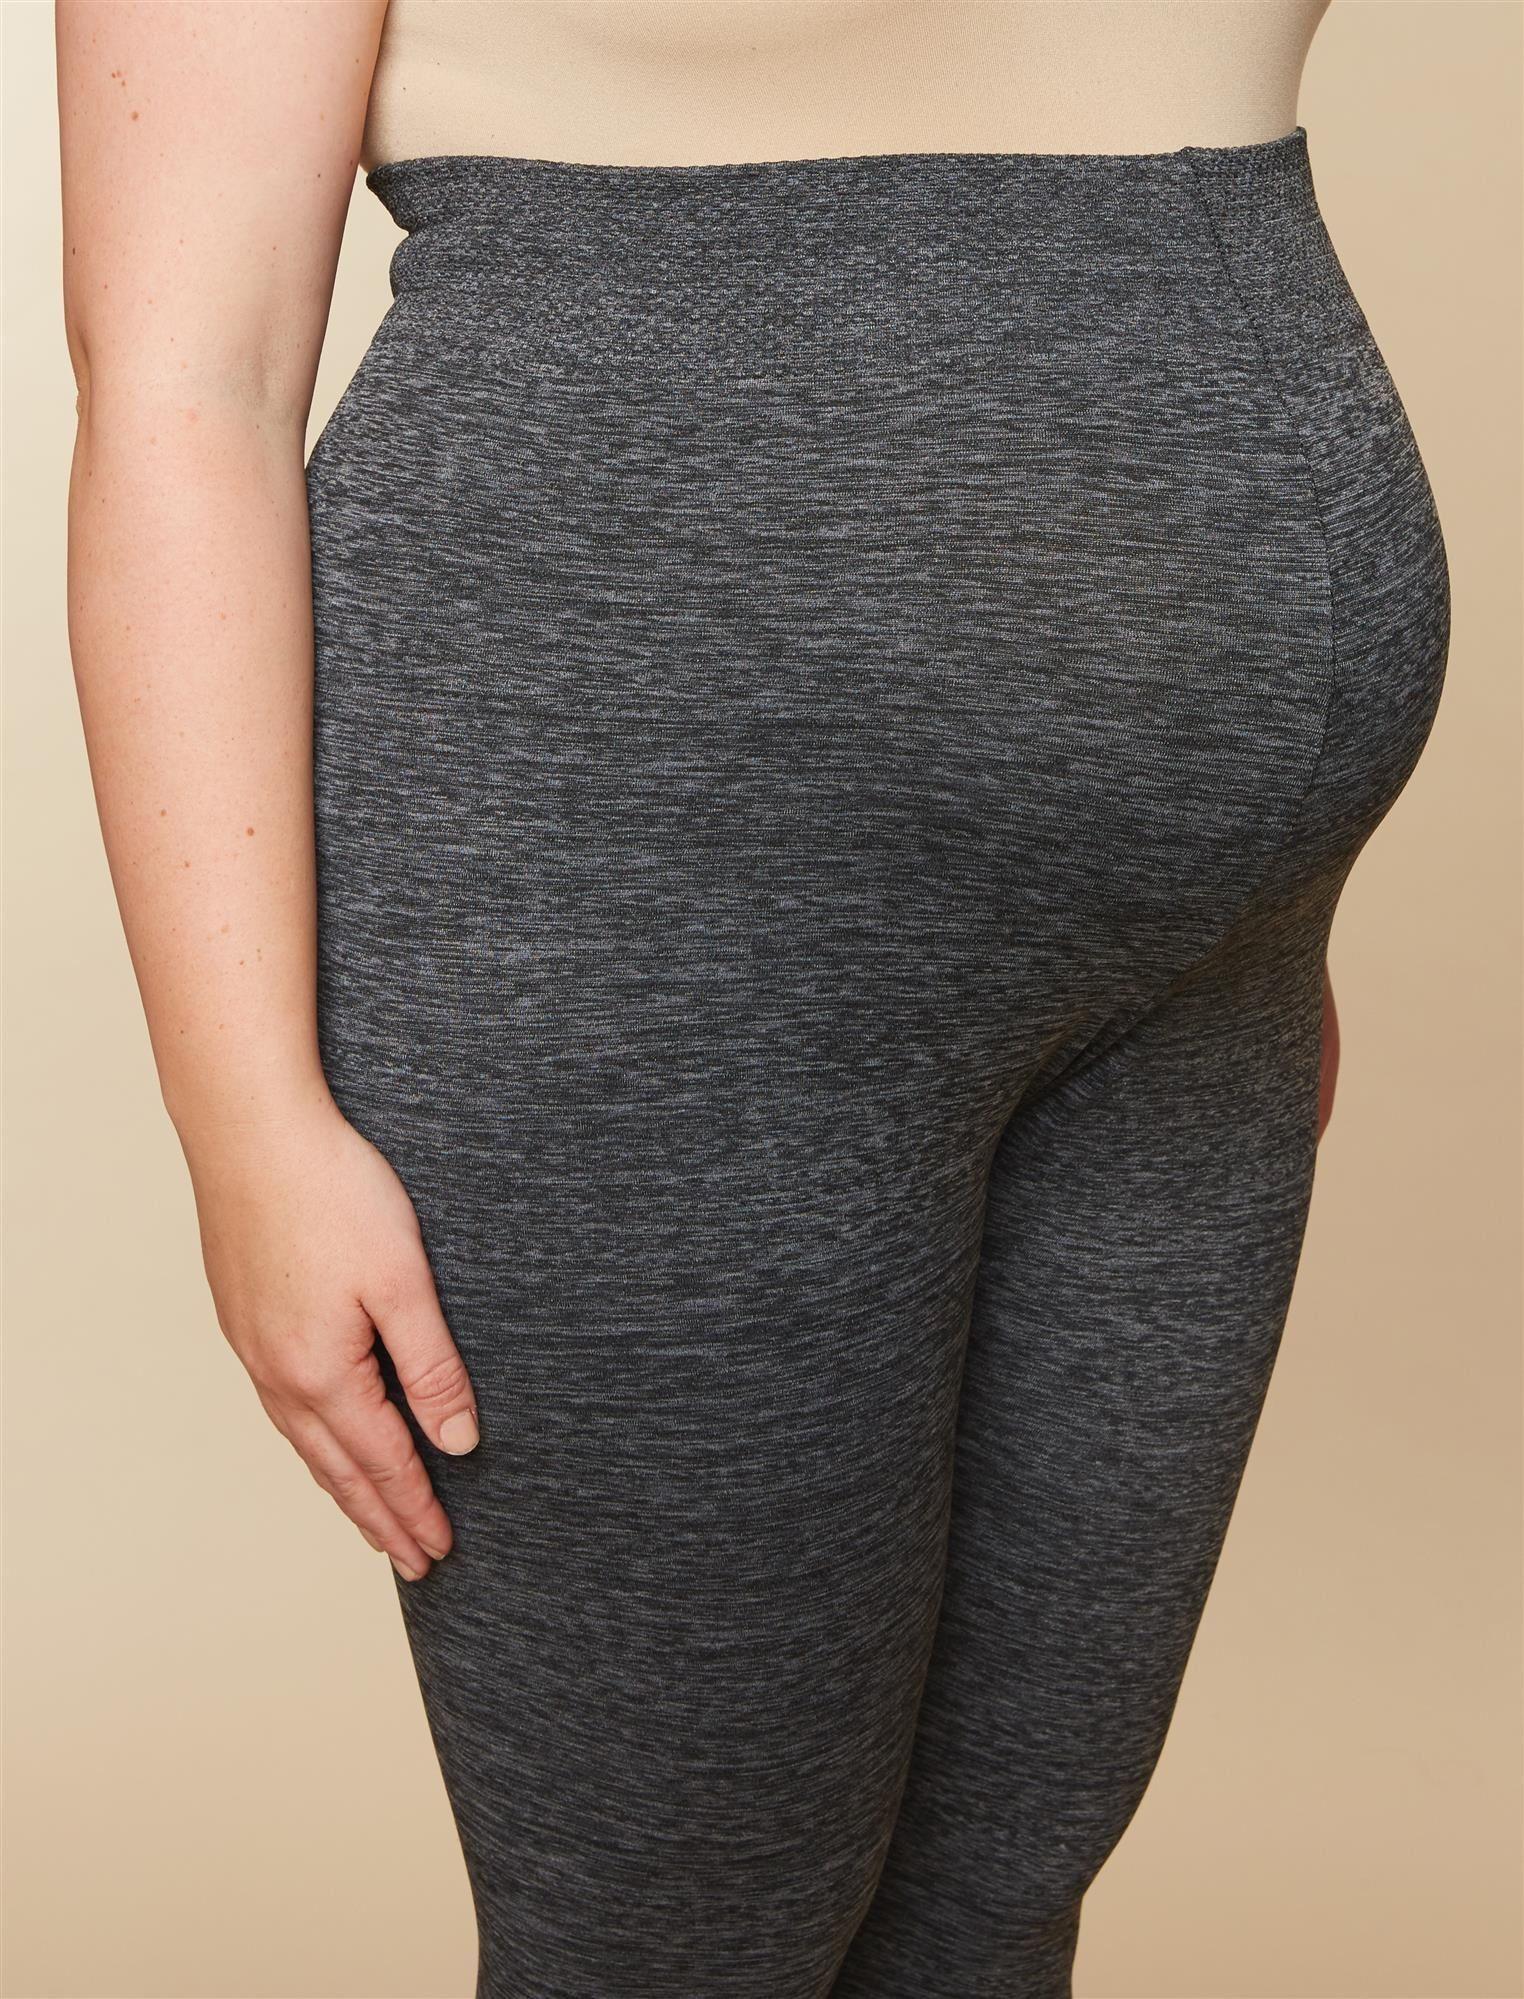 ad99e2cb0ac4f Maternity Outfits - loose-fitting maternity leggings : Motherhood Maternity  Womens Maternity Plus Size Full Length Fleece Lined Seamless Leggings Grey  Space ...